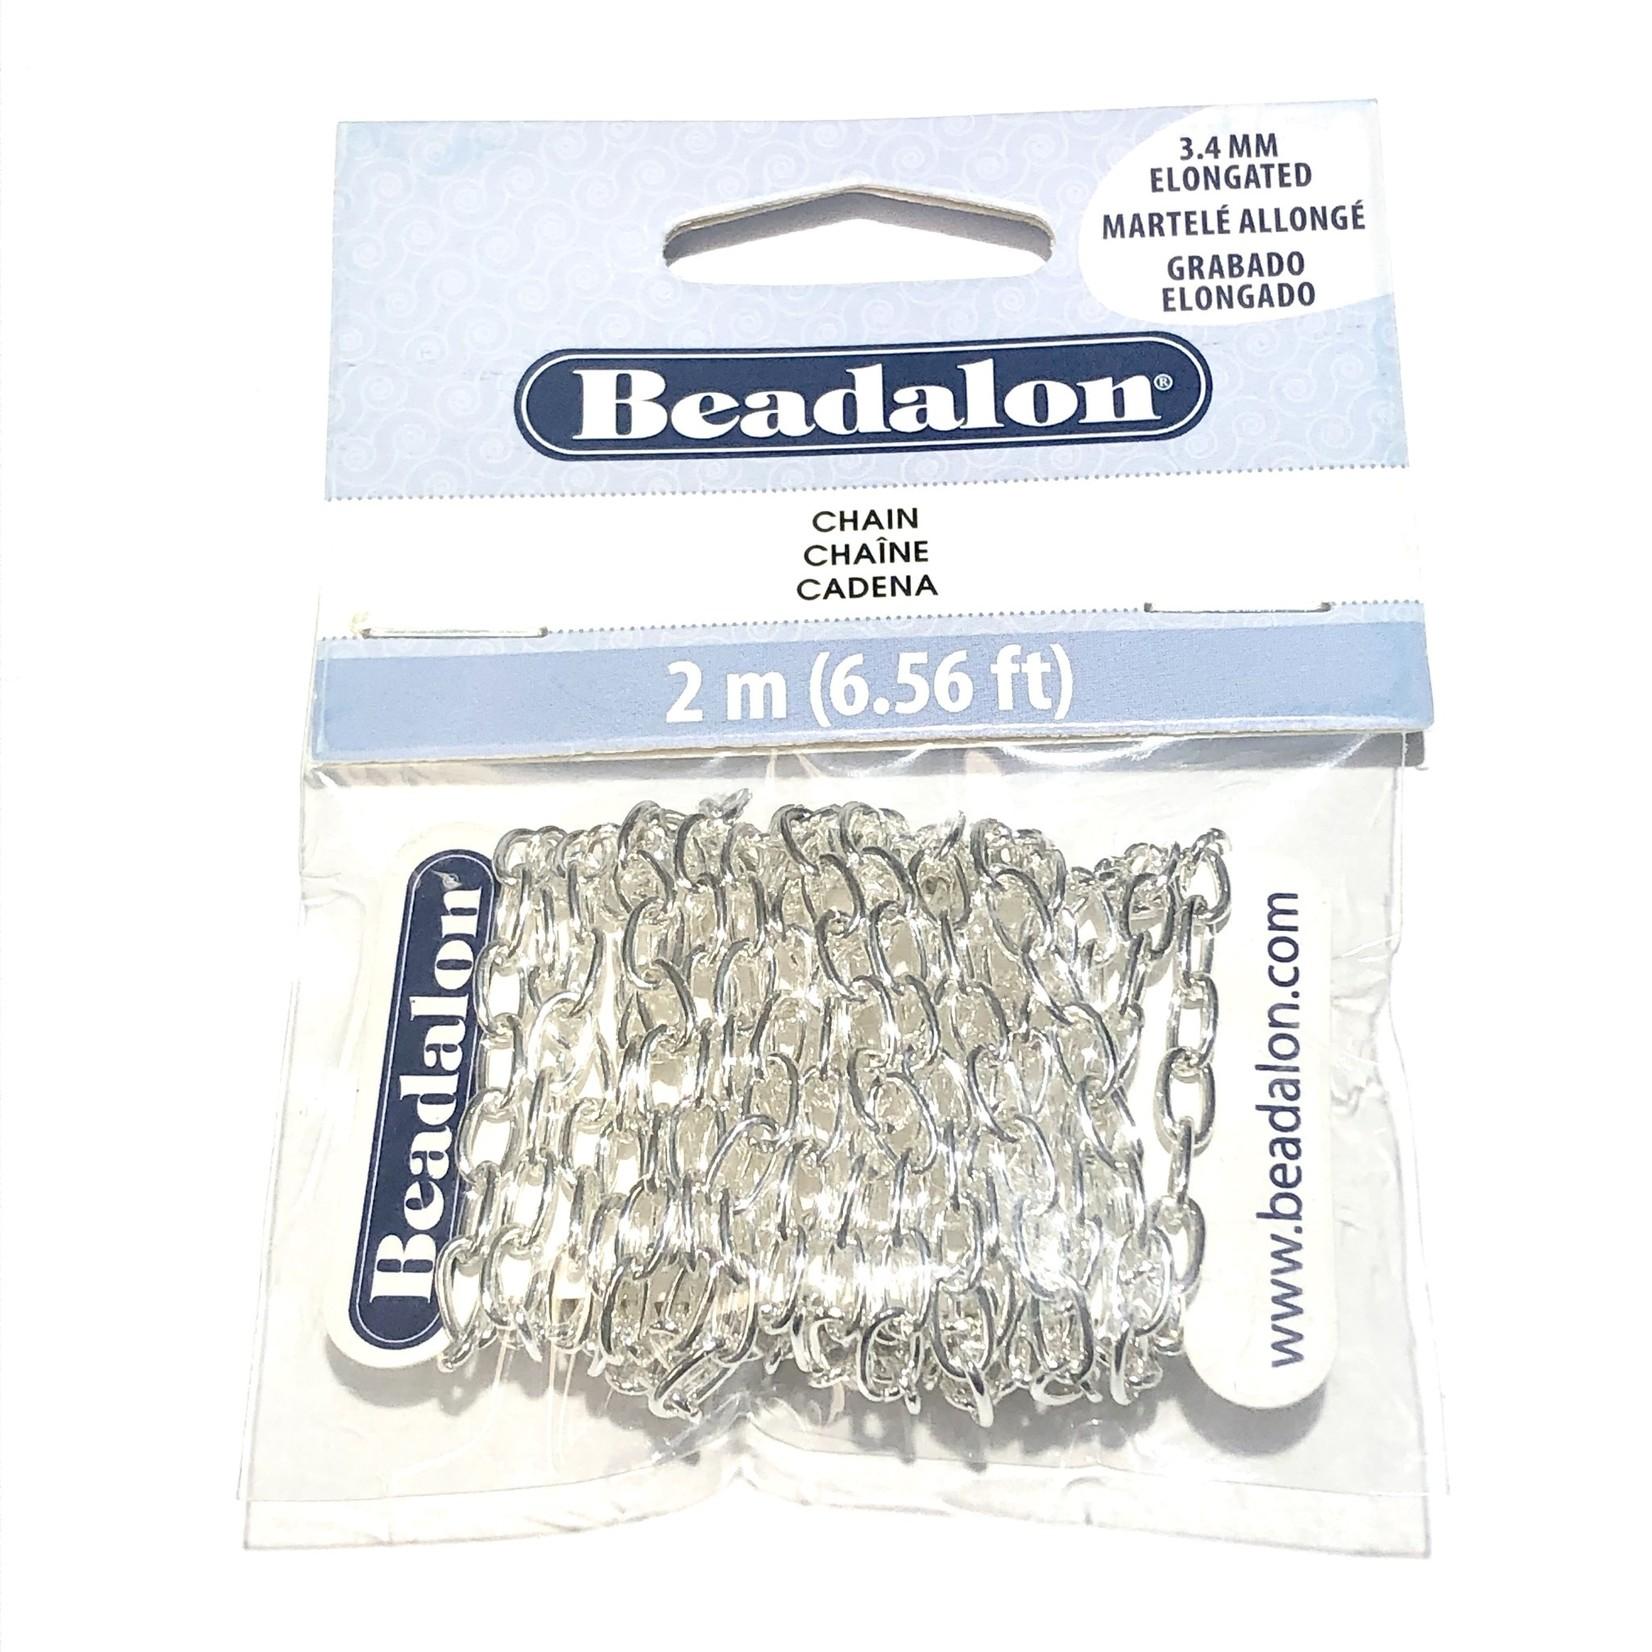 Beadalon Elongated Chain 3.4mm Silver Plated 2m